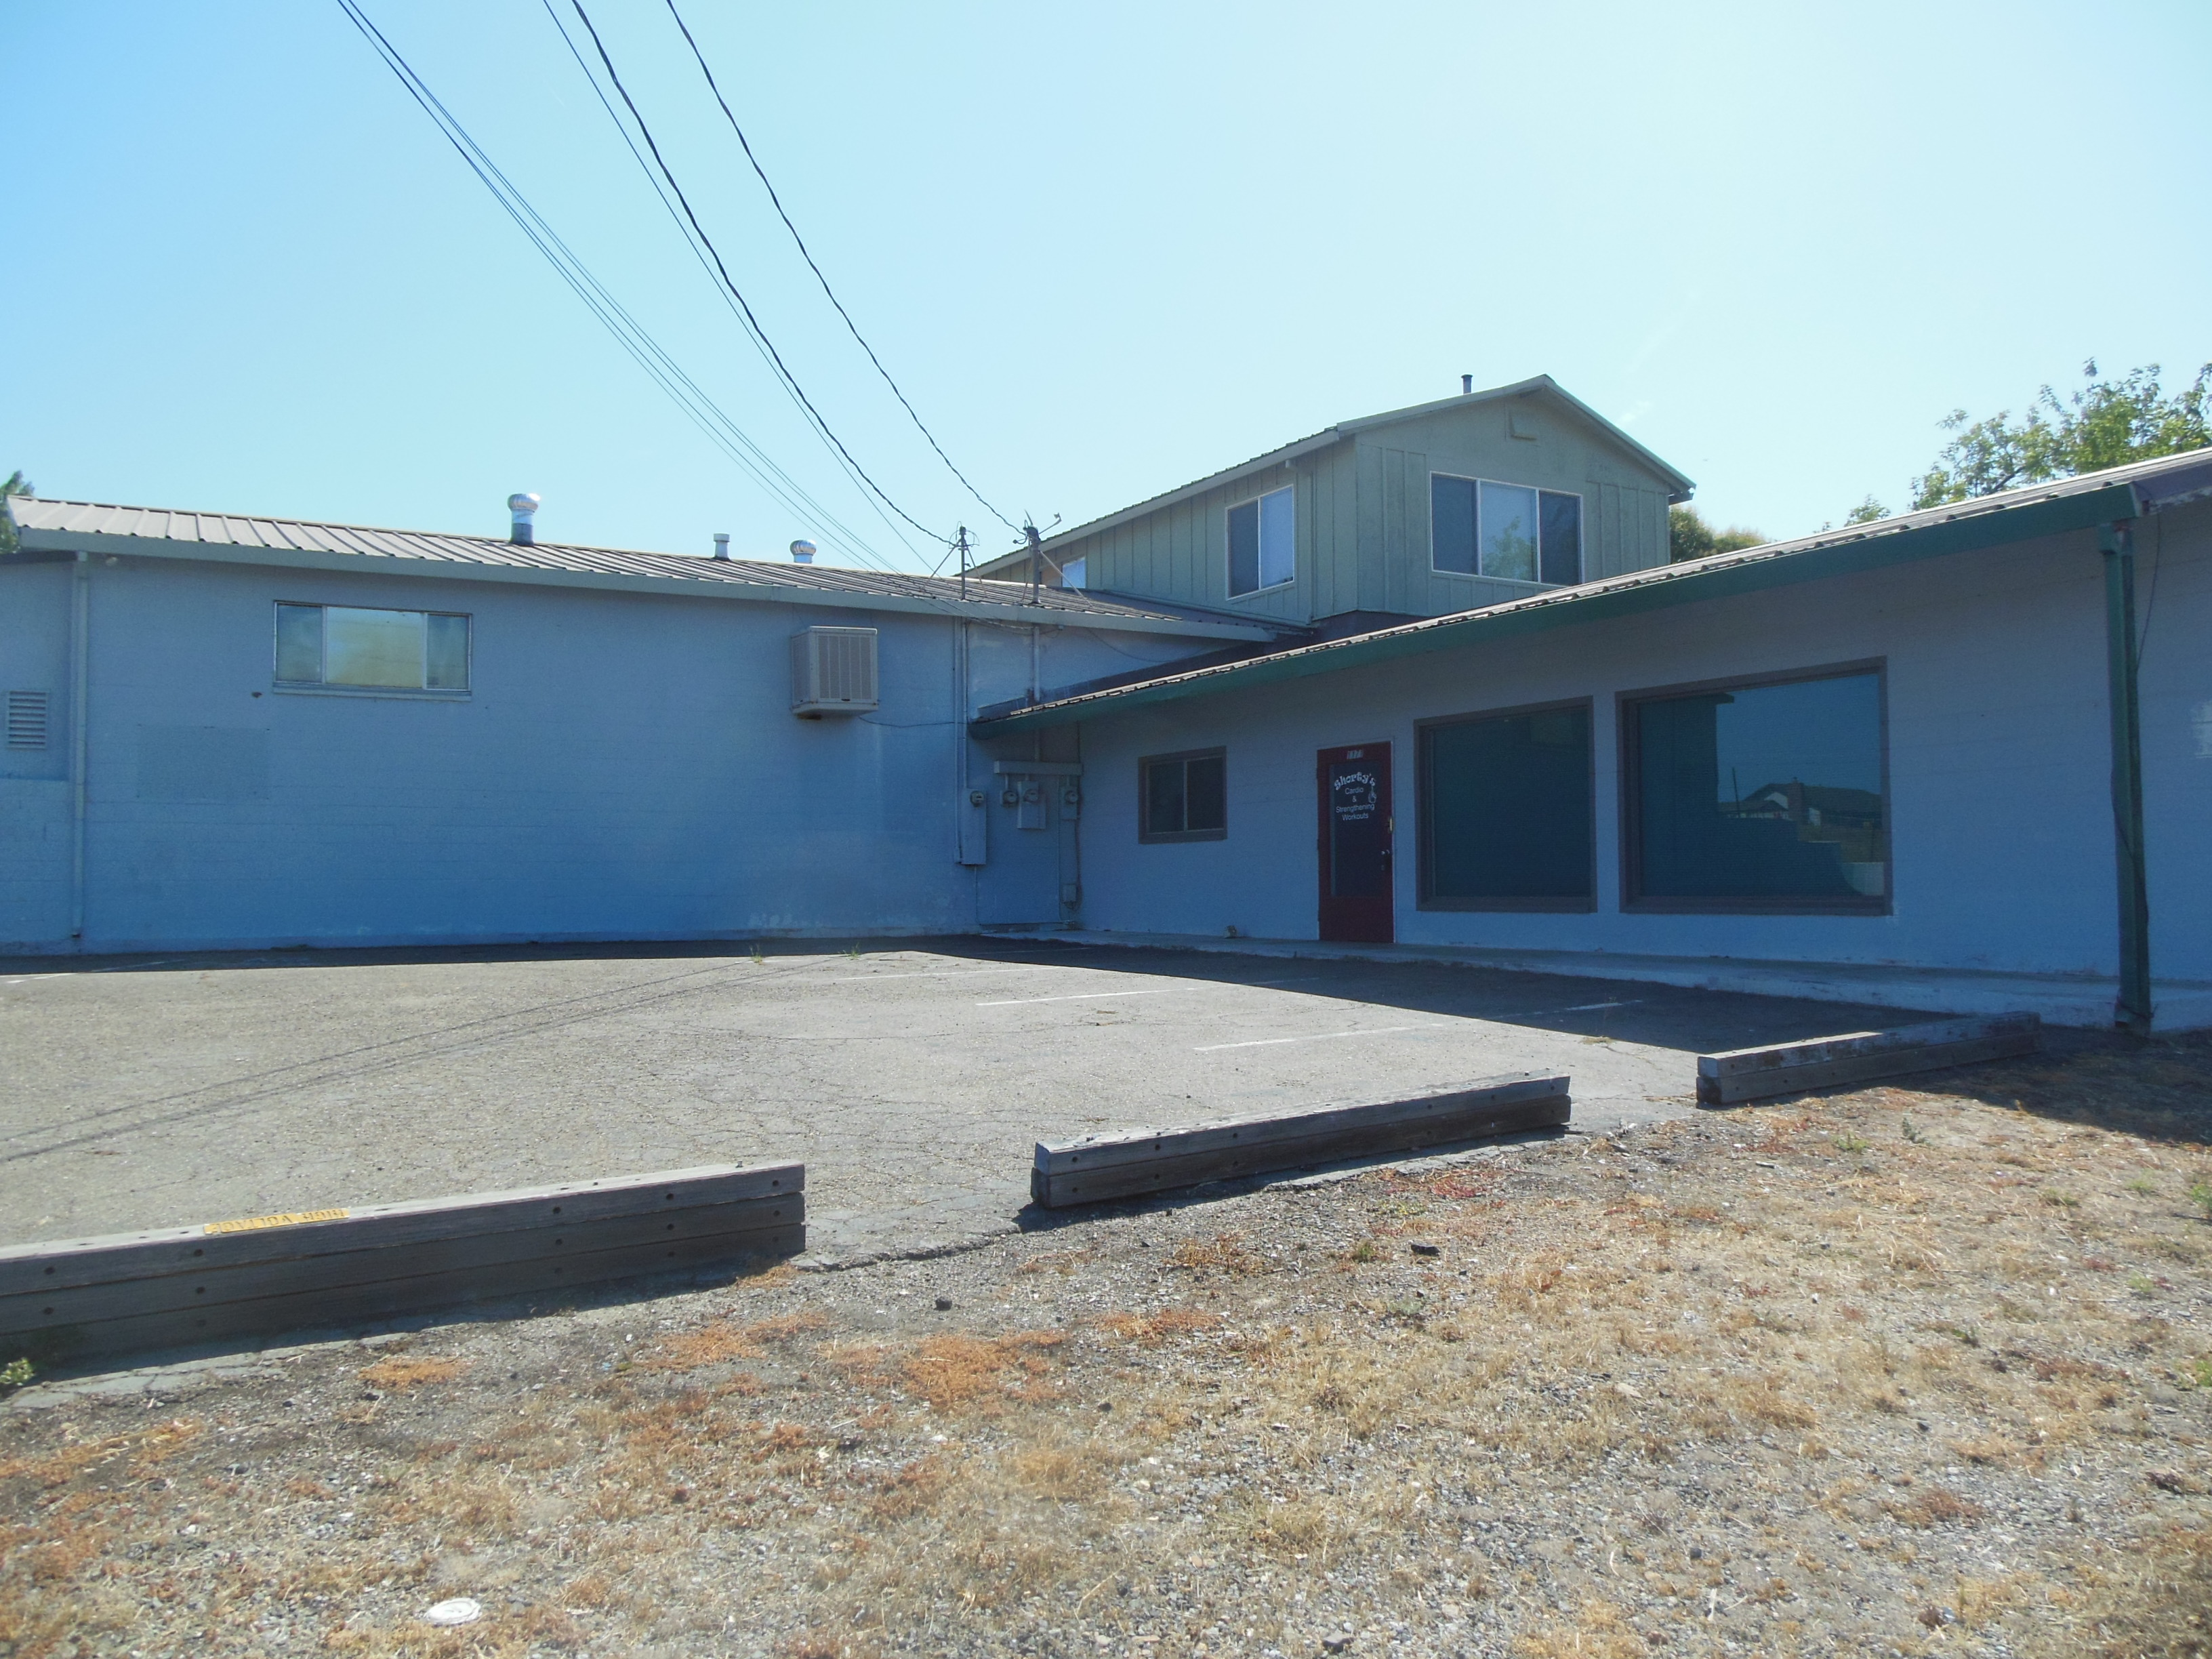 1171 Highway 49, San Andreas, California 95249